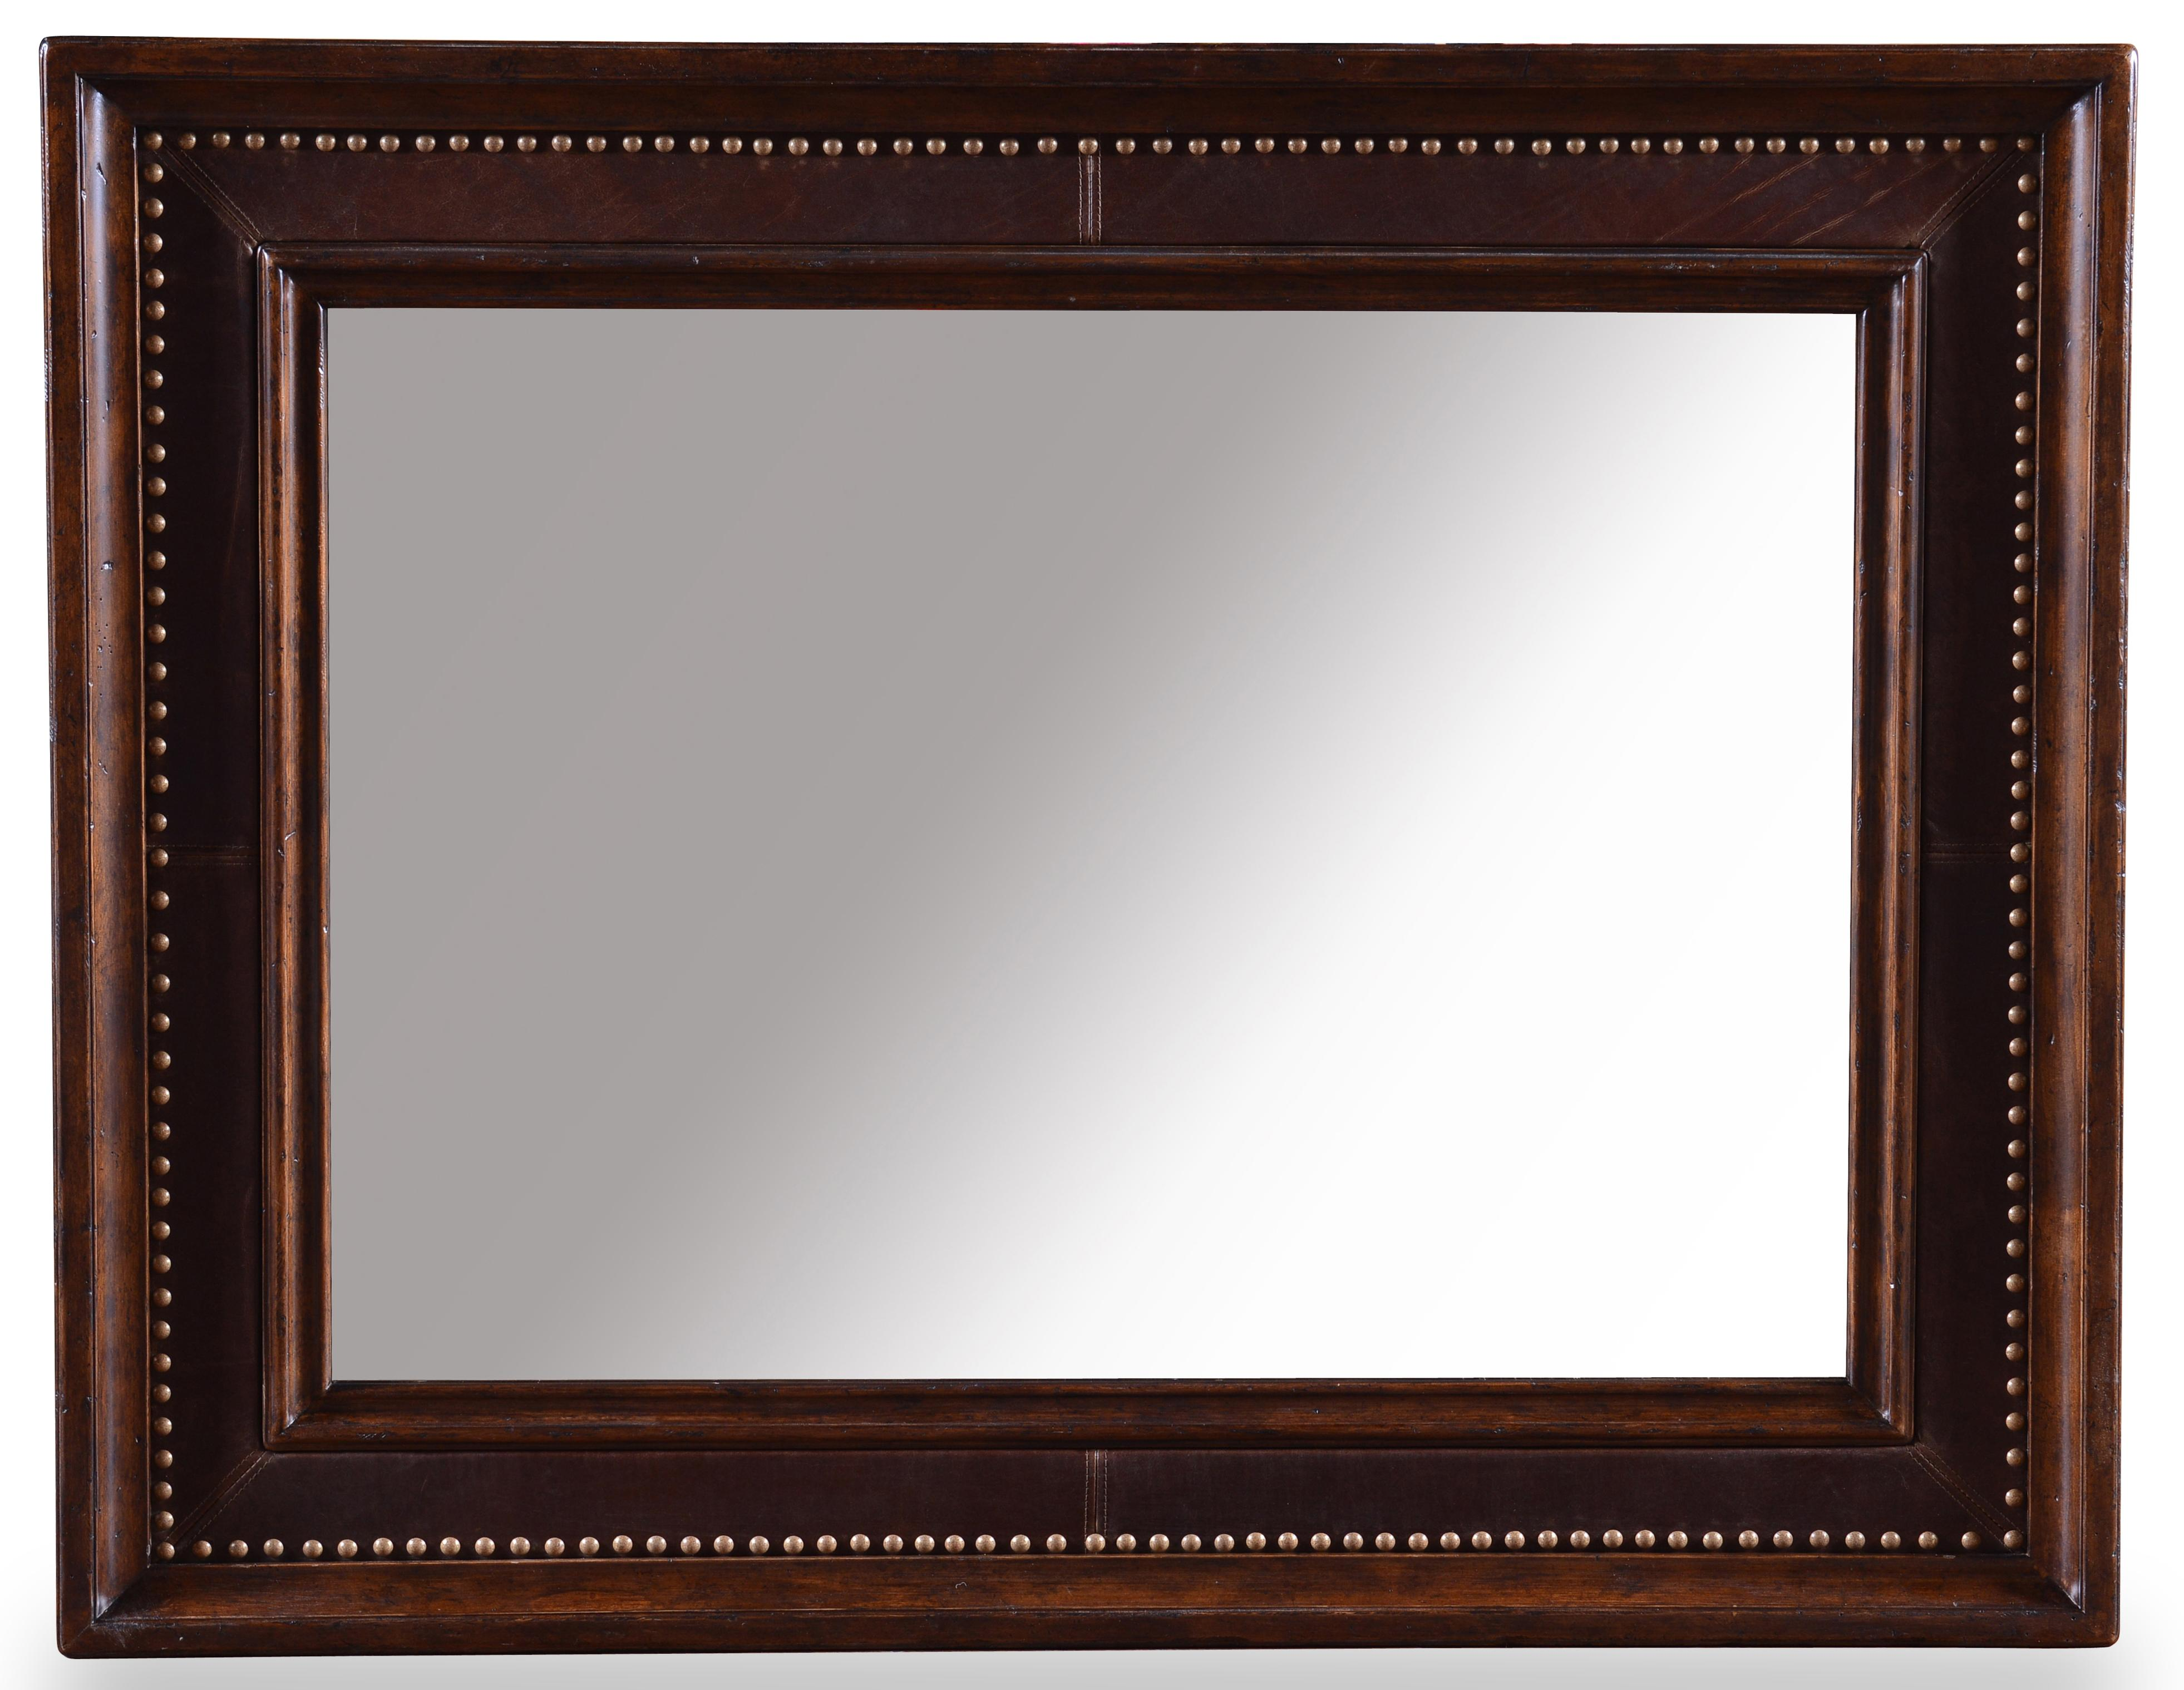 Belfort Signature Belvedere Landscape Mirror - Item Number: 205120-2304